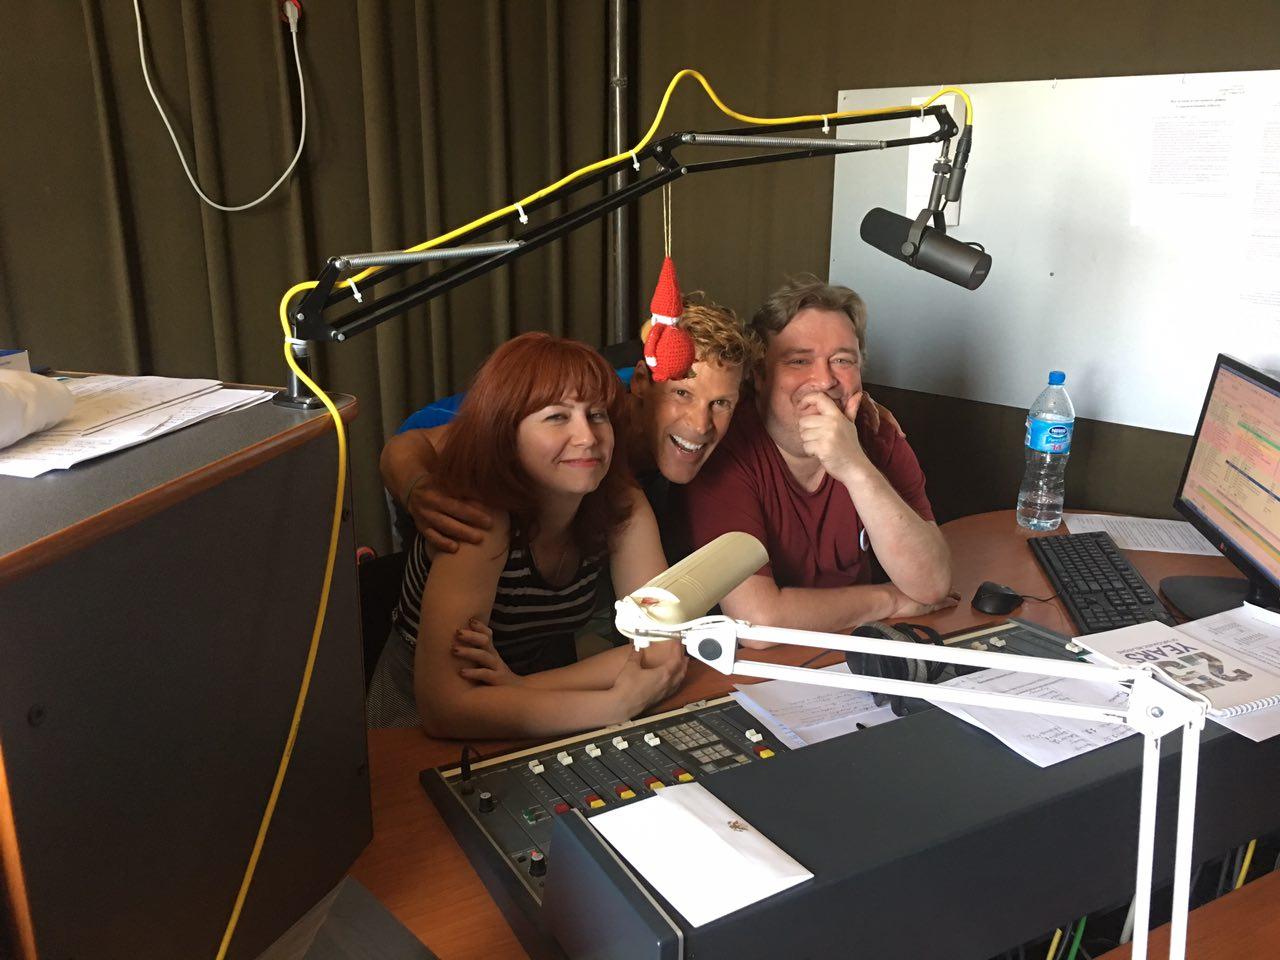 Dean behind the radio show microphone